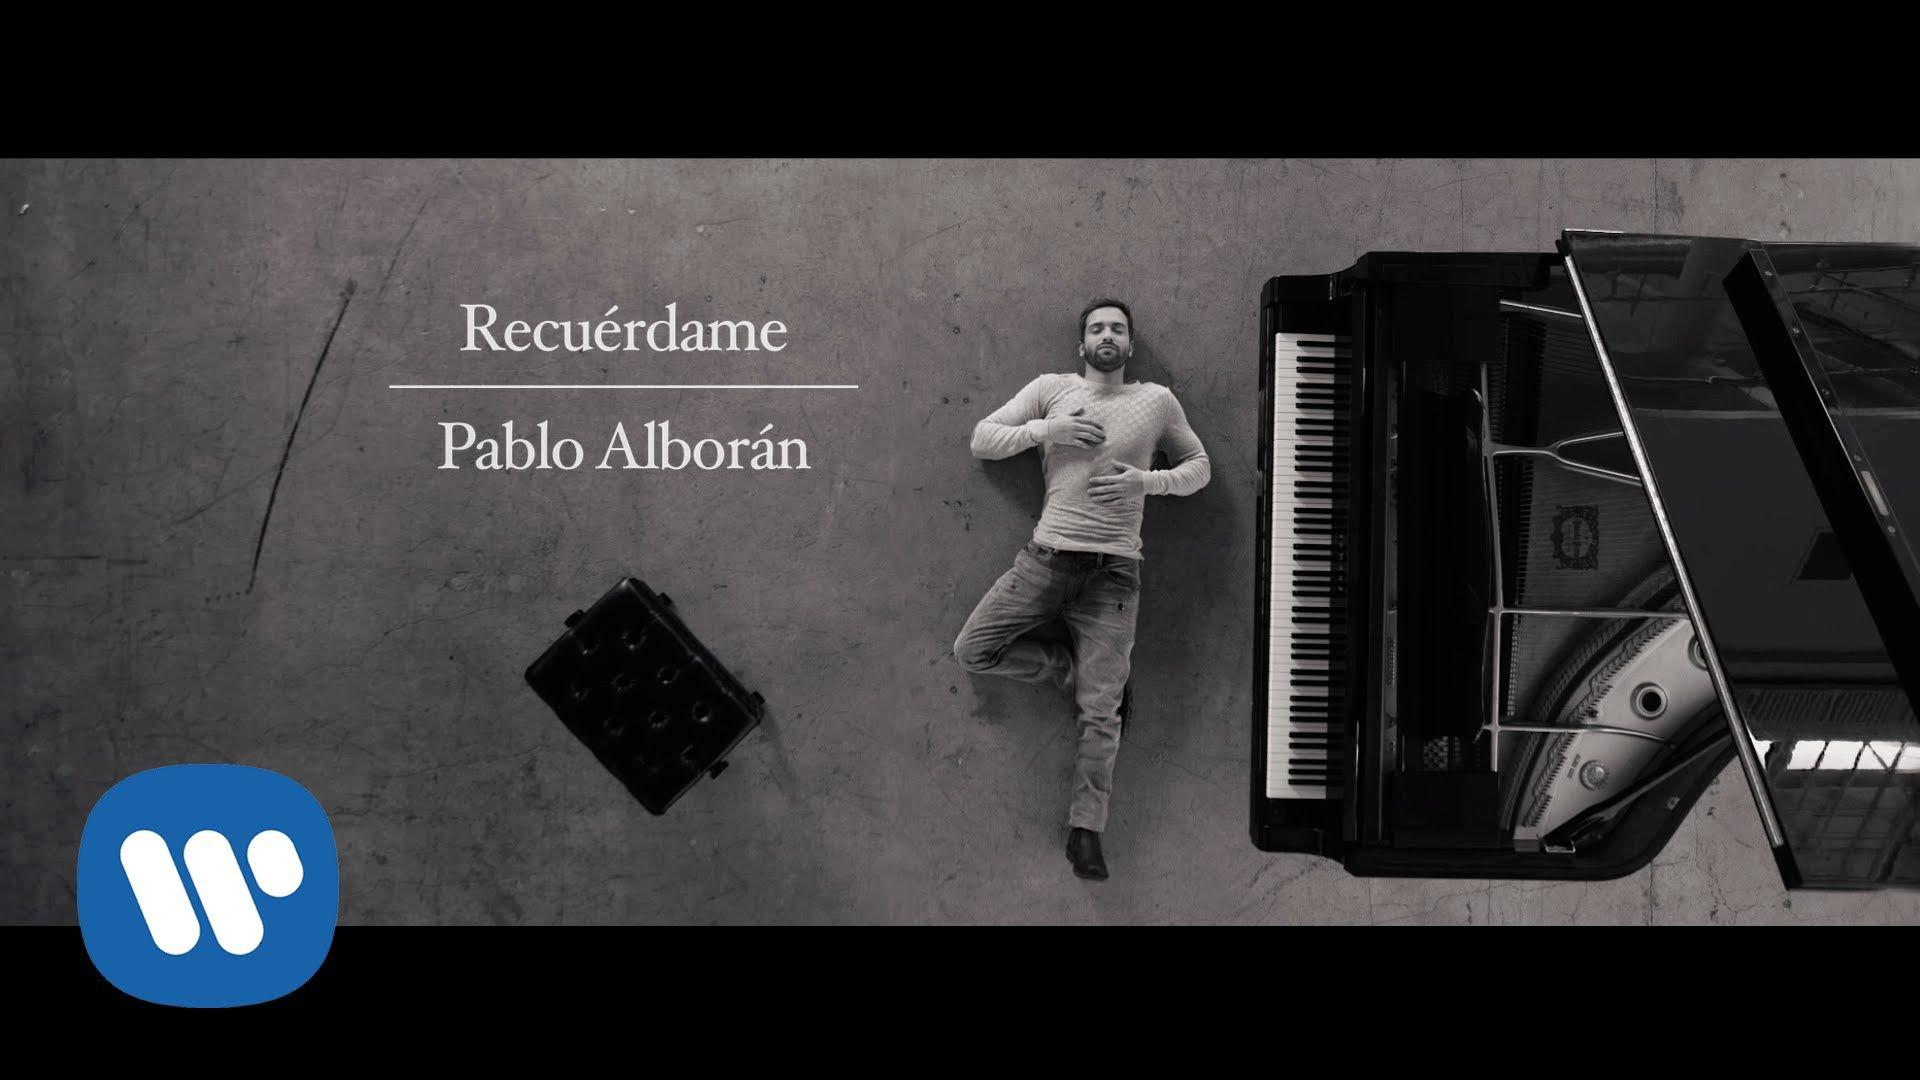 Pablo Alborán Recuérdame (Videoclip oficial) Spain